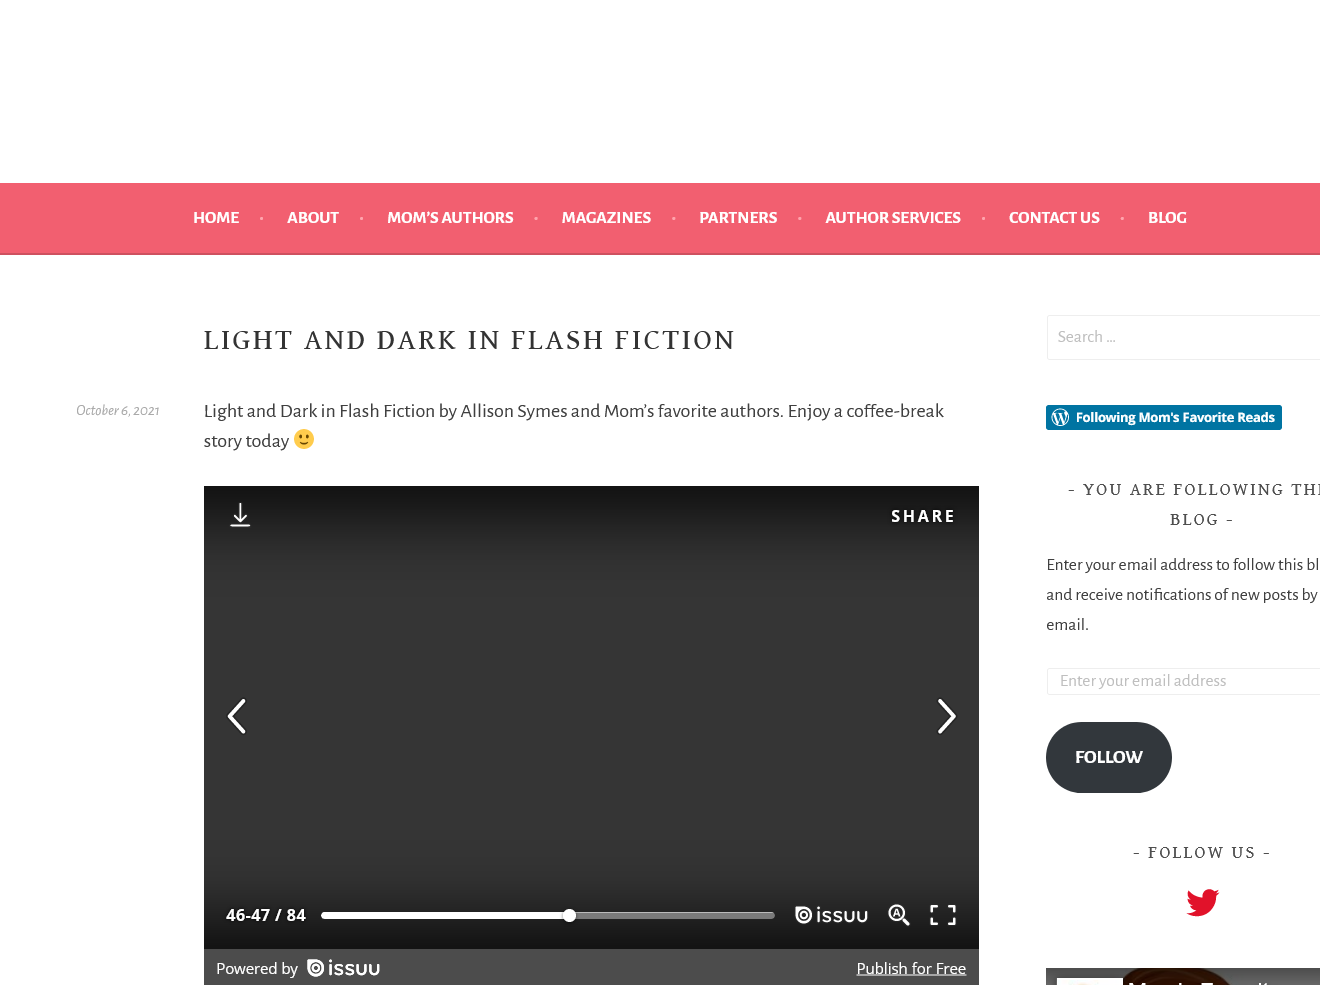 Screenshot 2021-10-06 at 20-01-30 Light and Dark in Flash Fiction